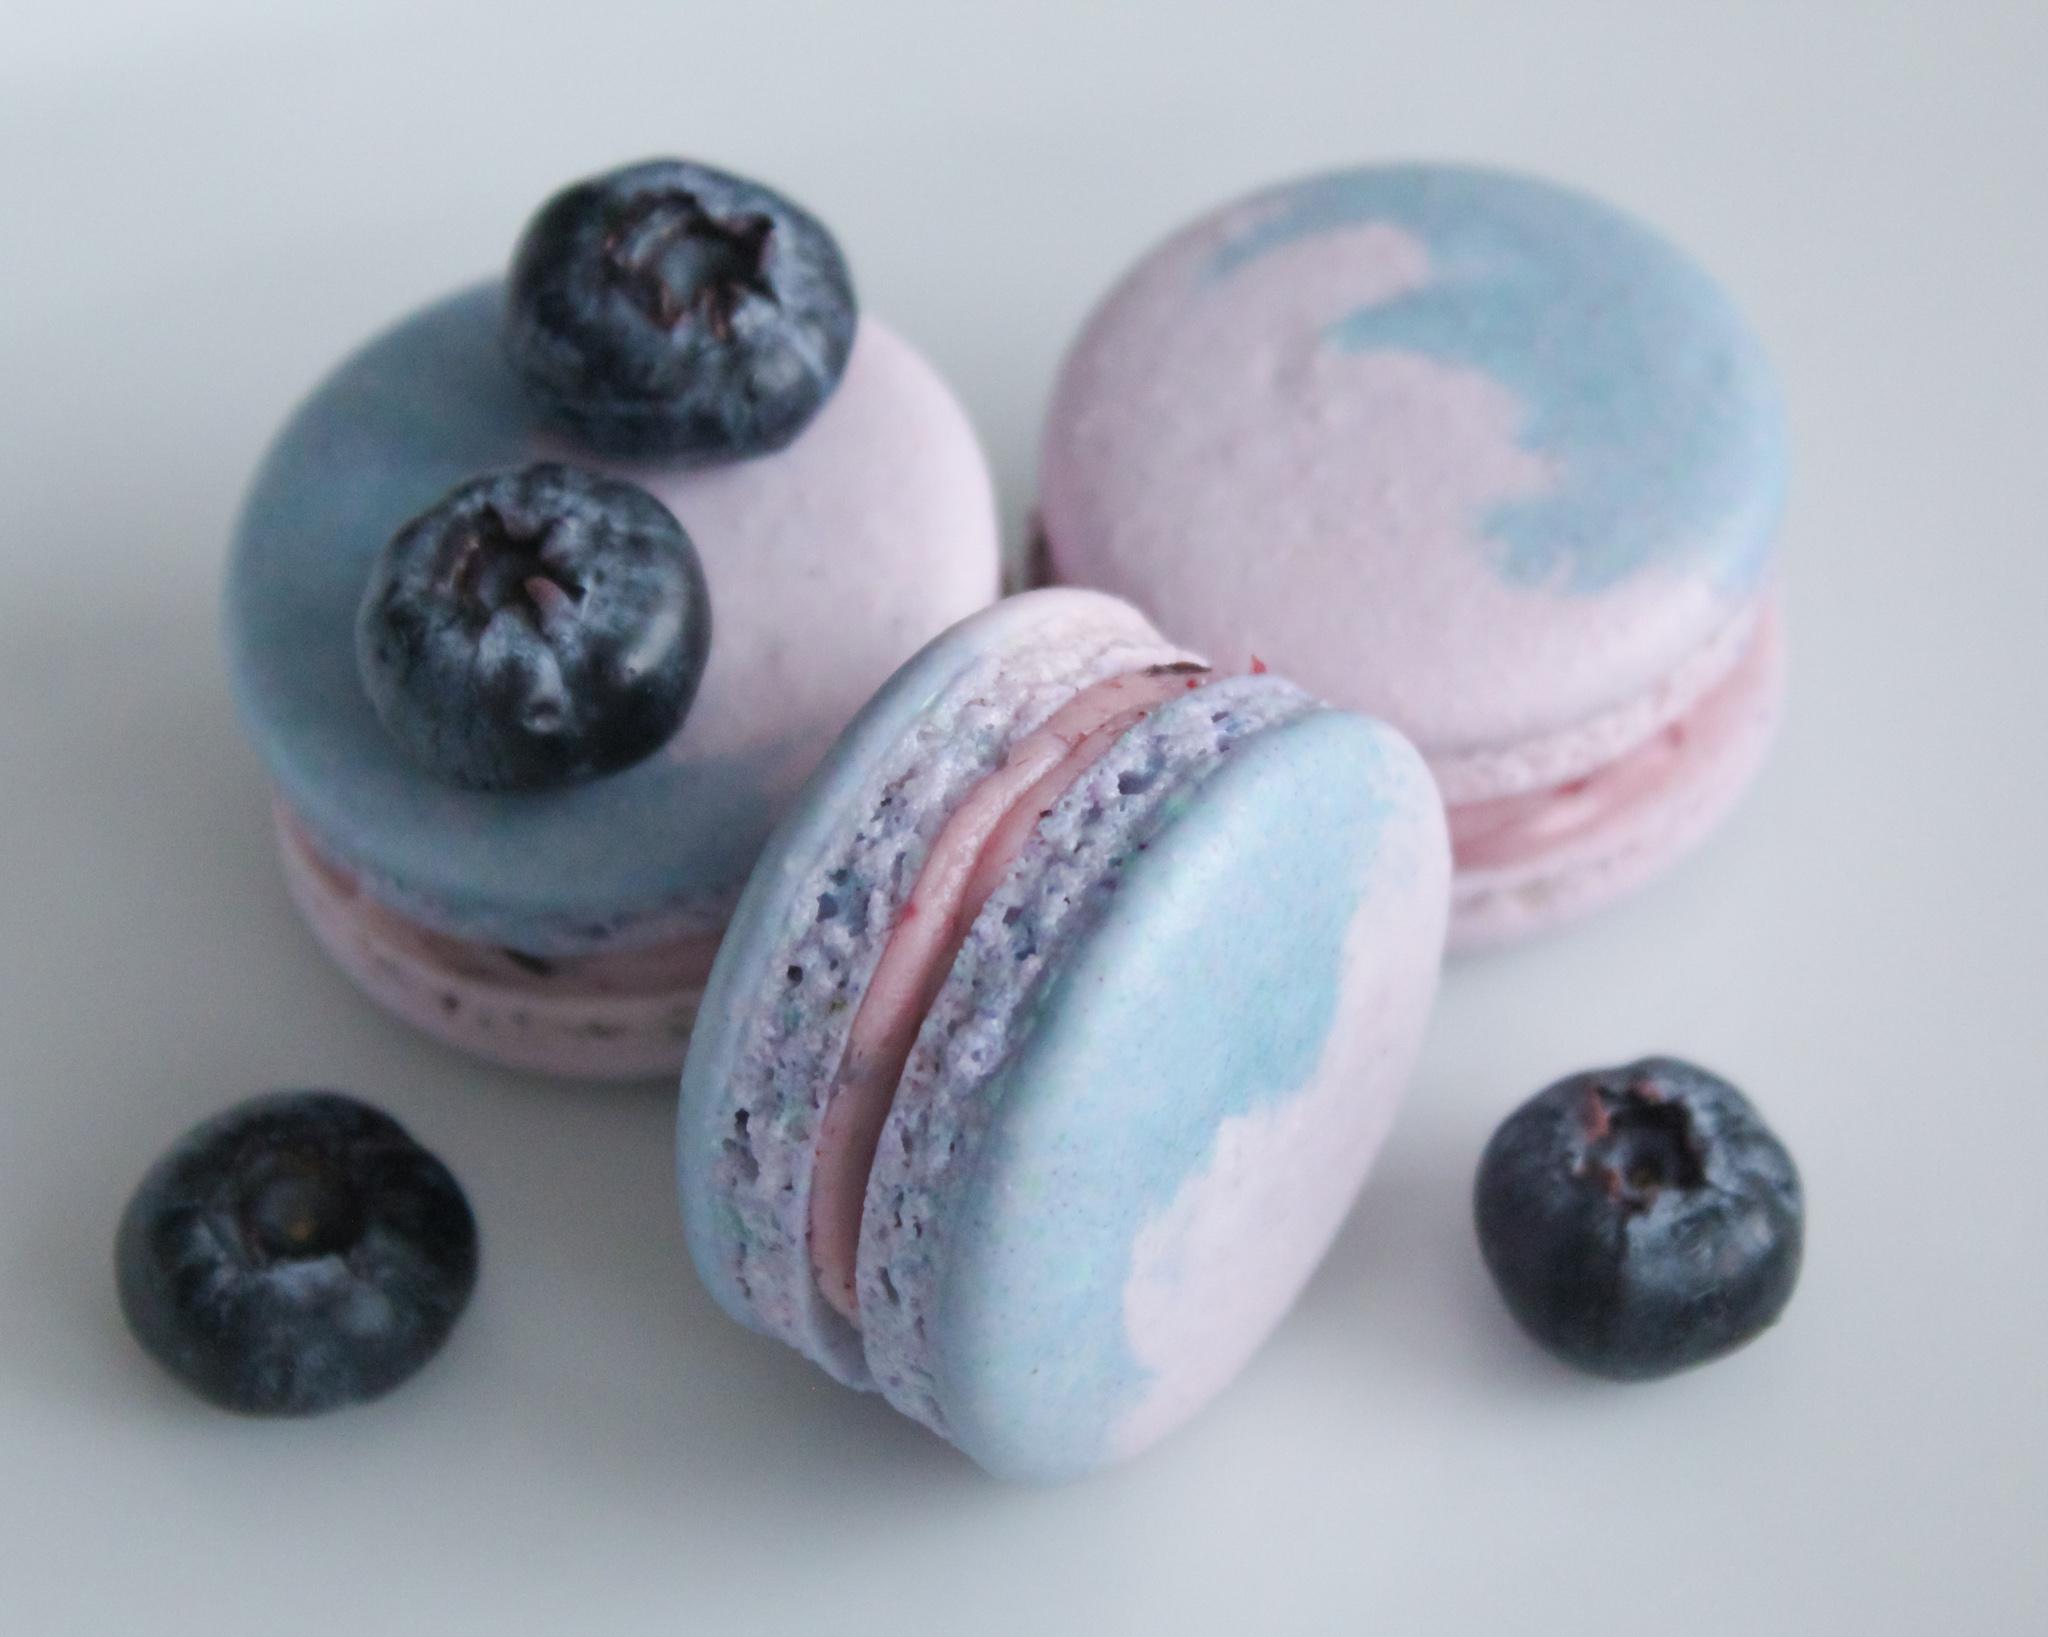 Blueberry Lavender *LIMITED-RELEASE FLAVOR*